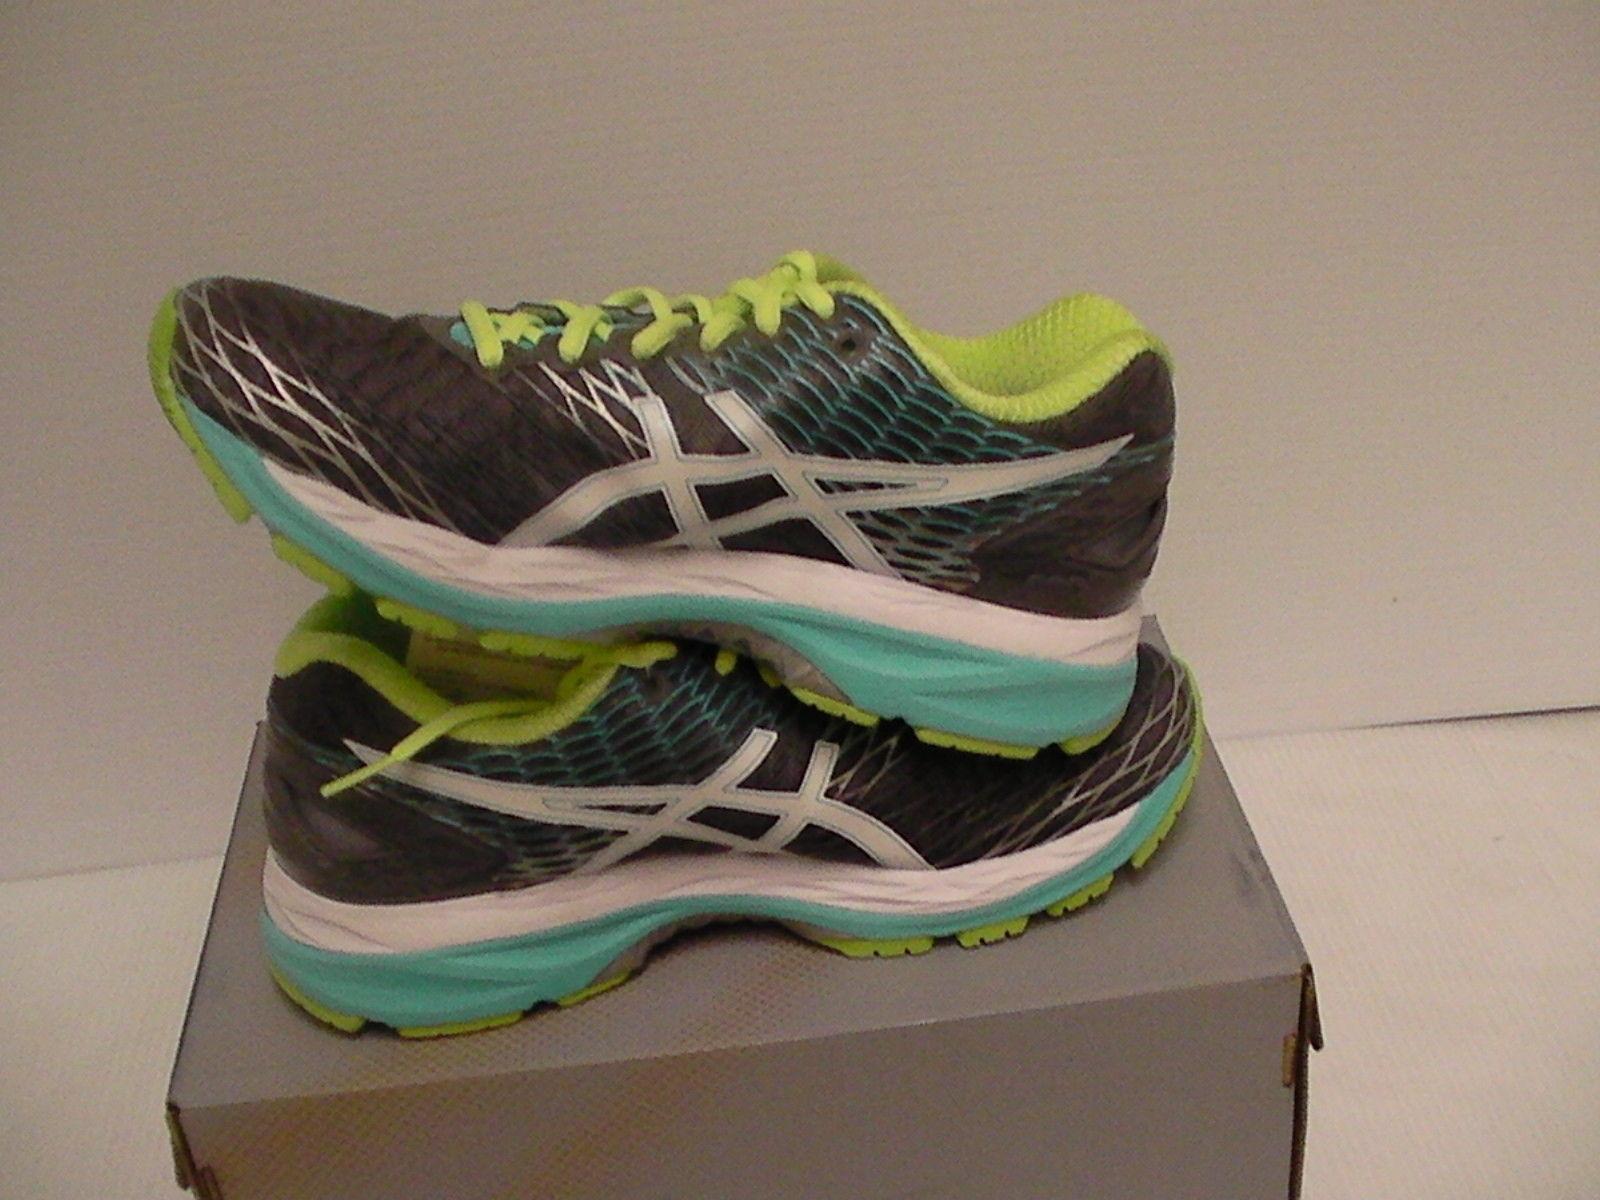 ff57713bc300 Asics women s shoes gel nimbus 18 titanium and 50 similar items. 57